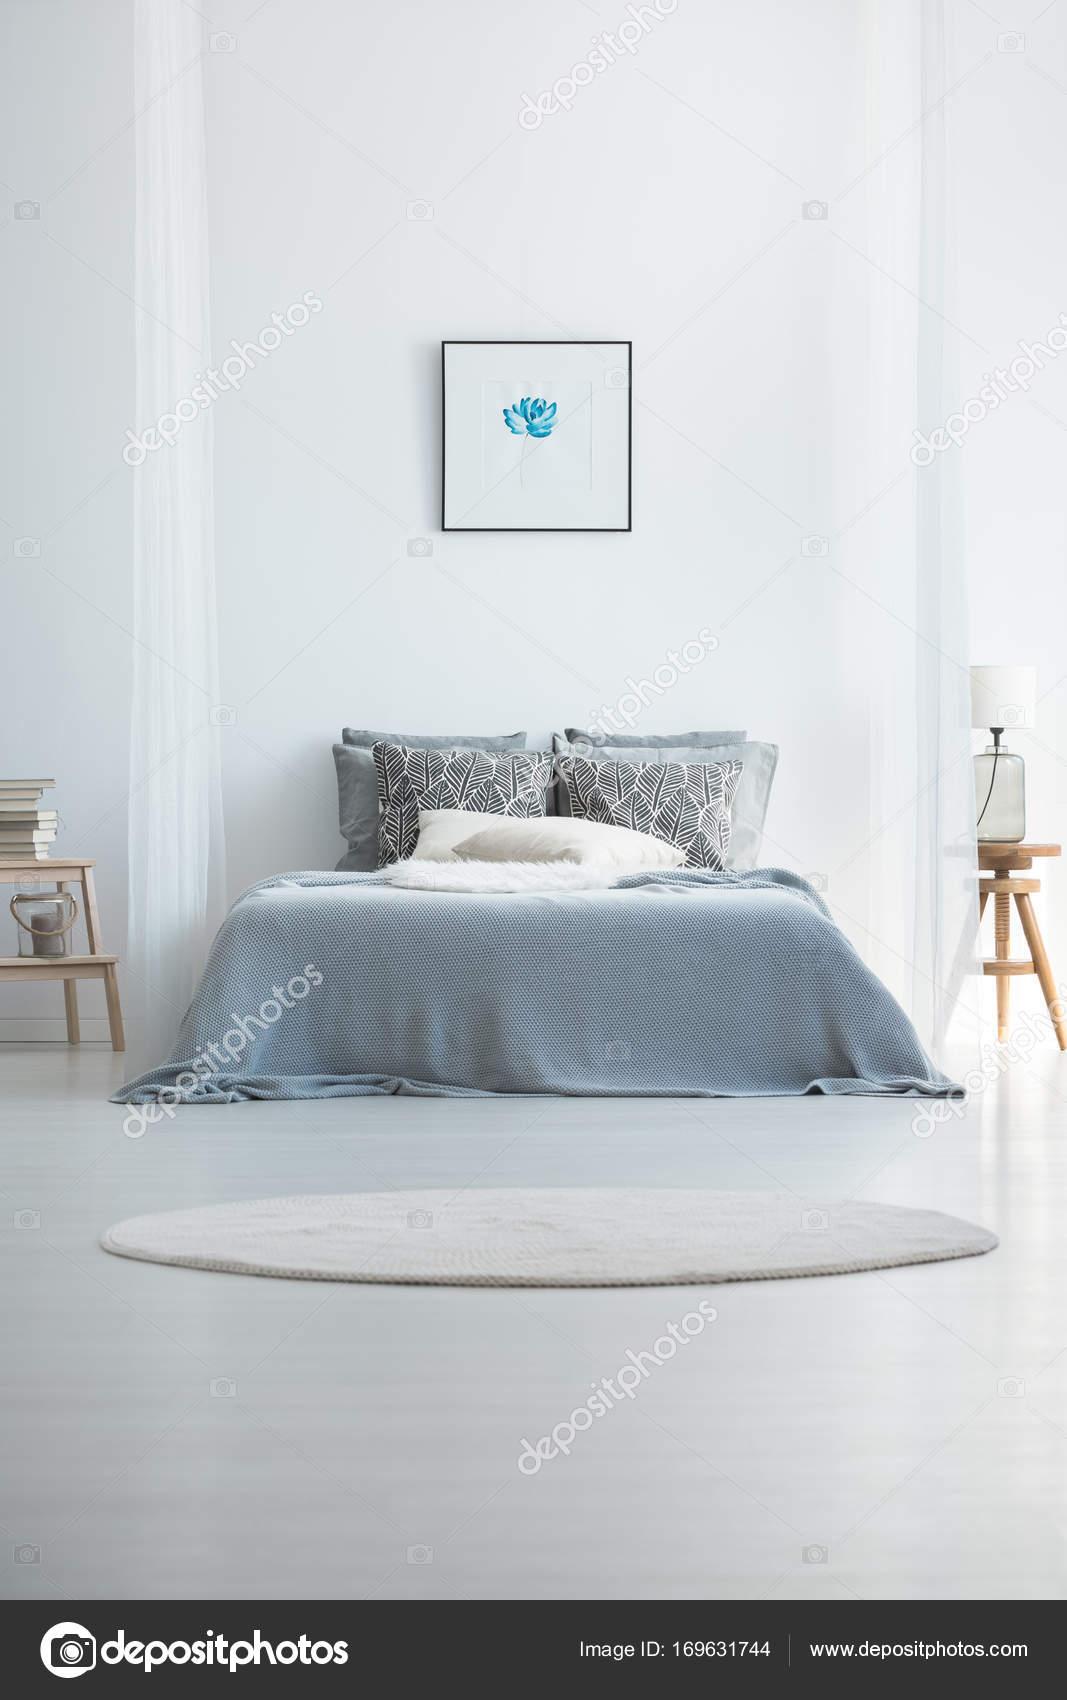 https://st3.depositphotos.com/2249091/16963/i/1600/depositphotos_169631744-stockafbeelding-tapijt-in-koude-slaapkamer-interieur.jpg